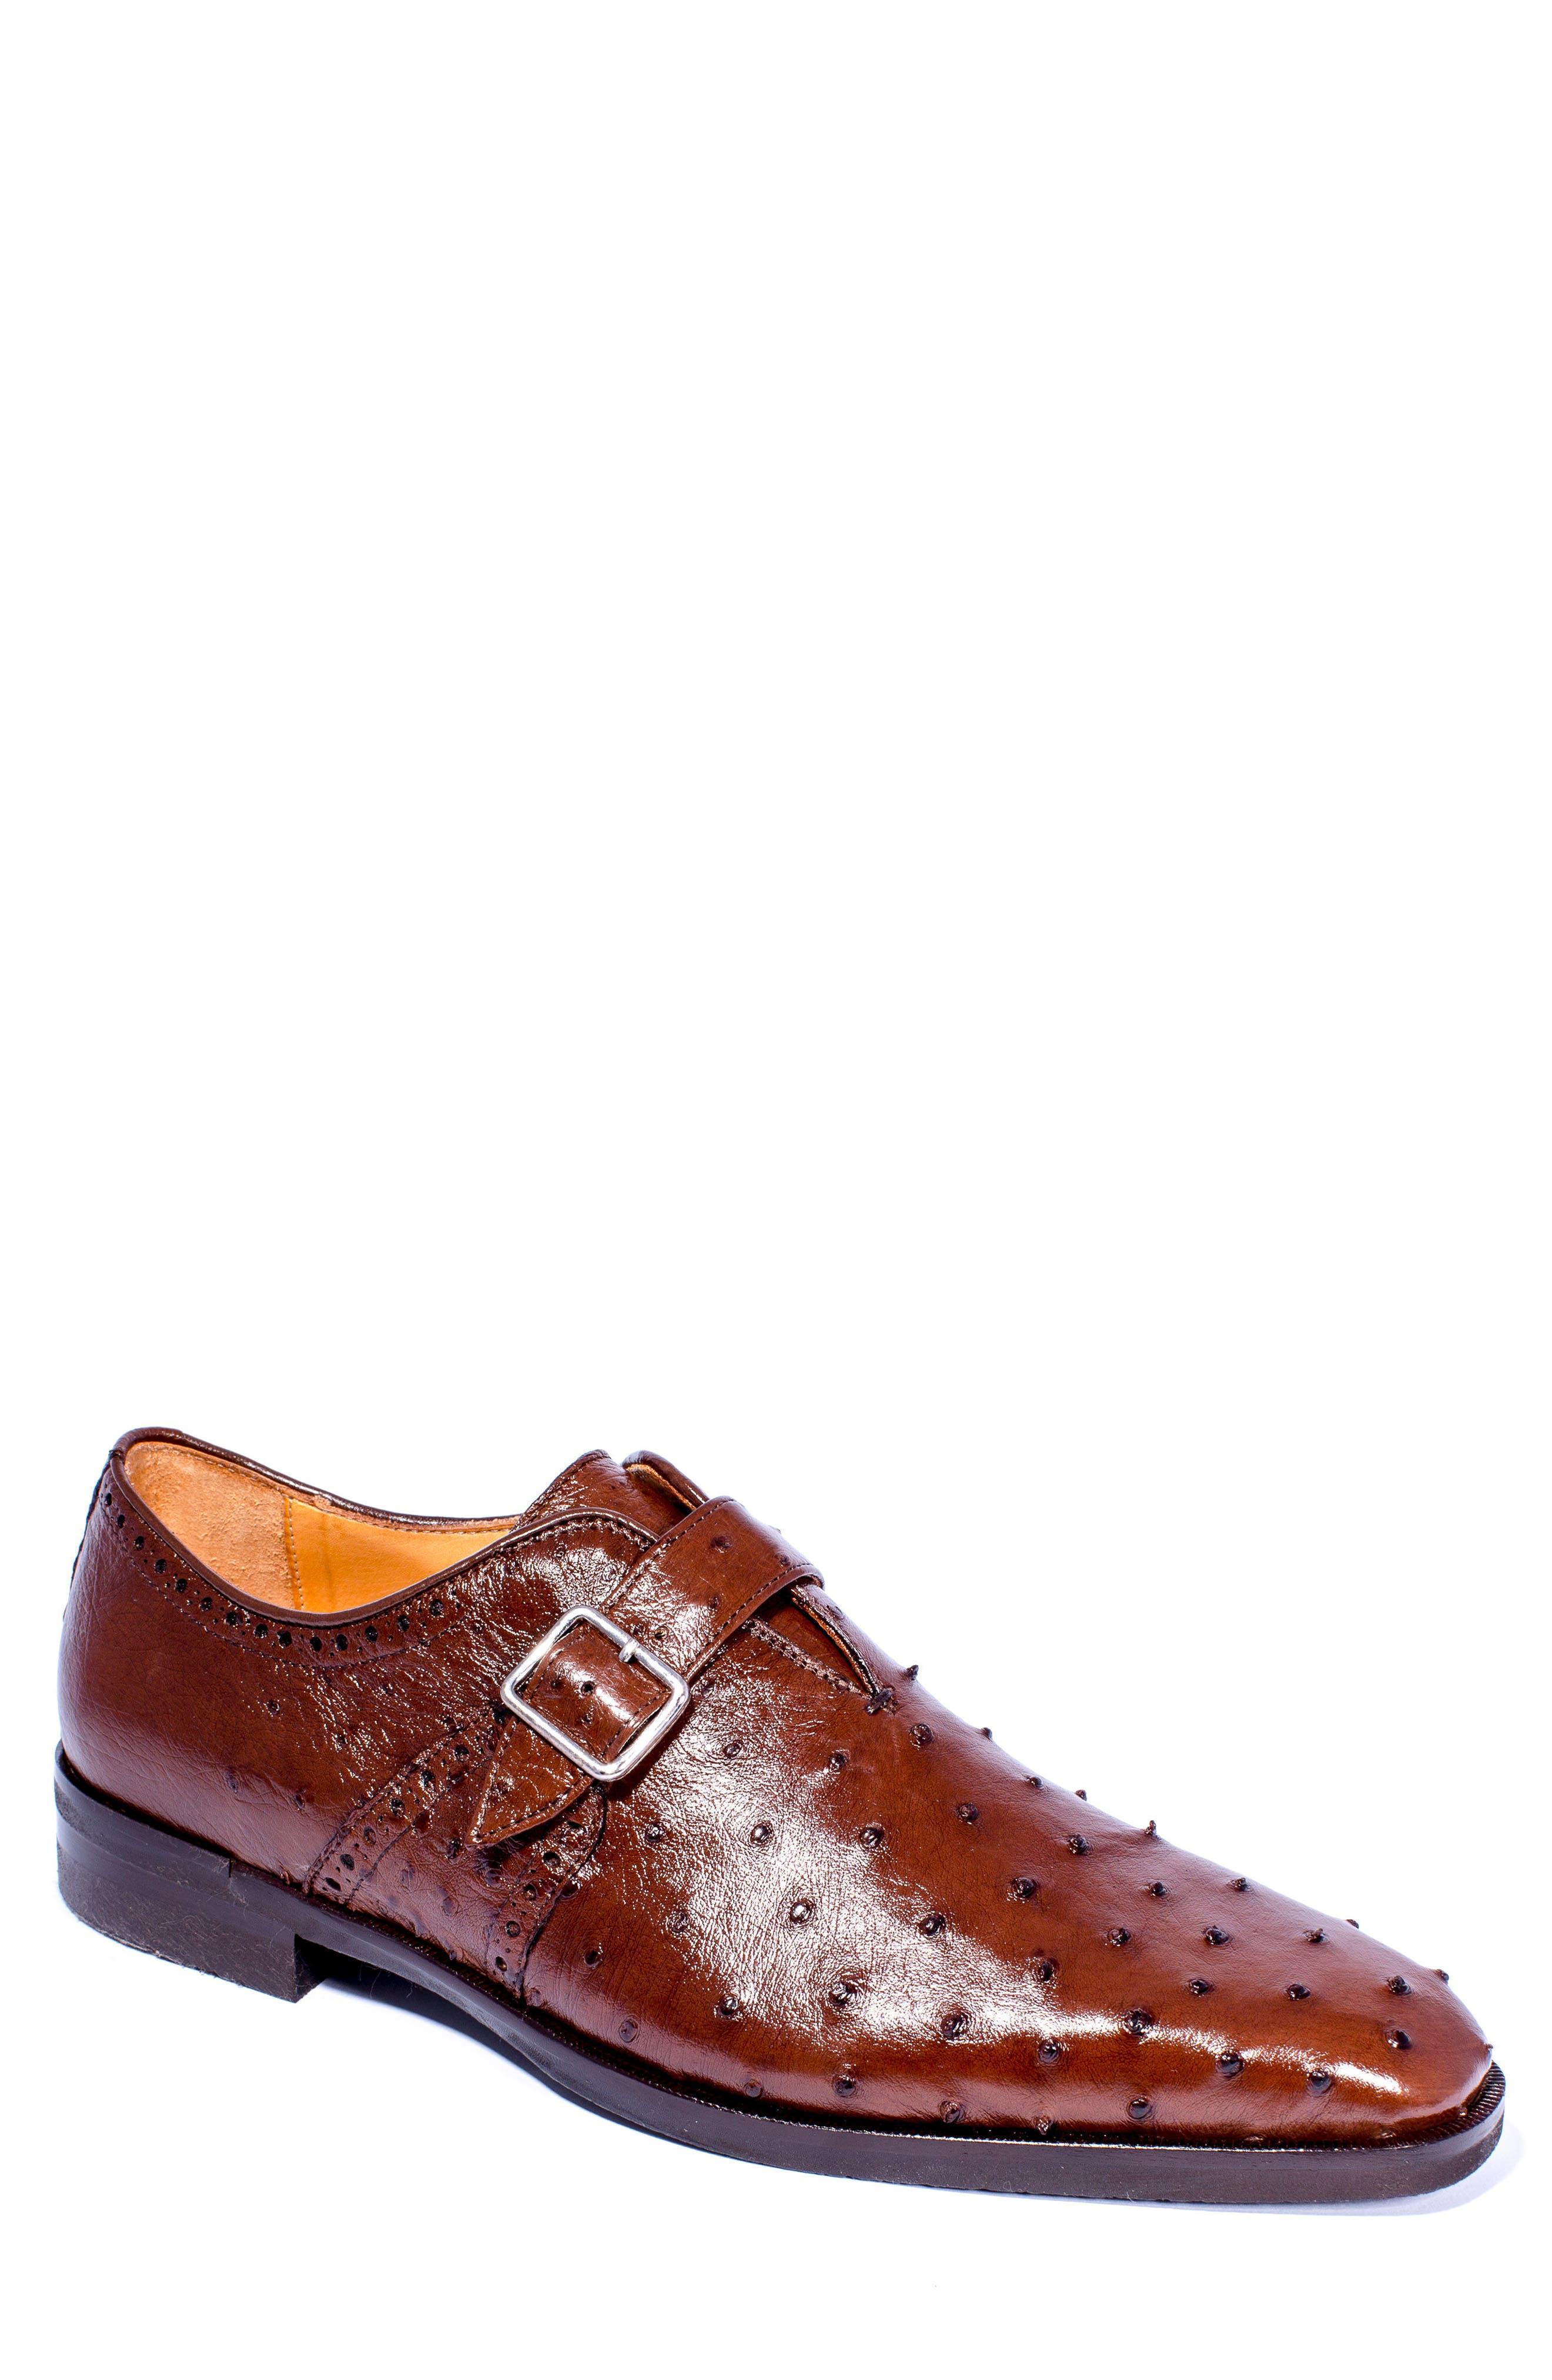 Main Image - Zelli Antonio Monk Strap Ostrich Leather Shoe (Men)